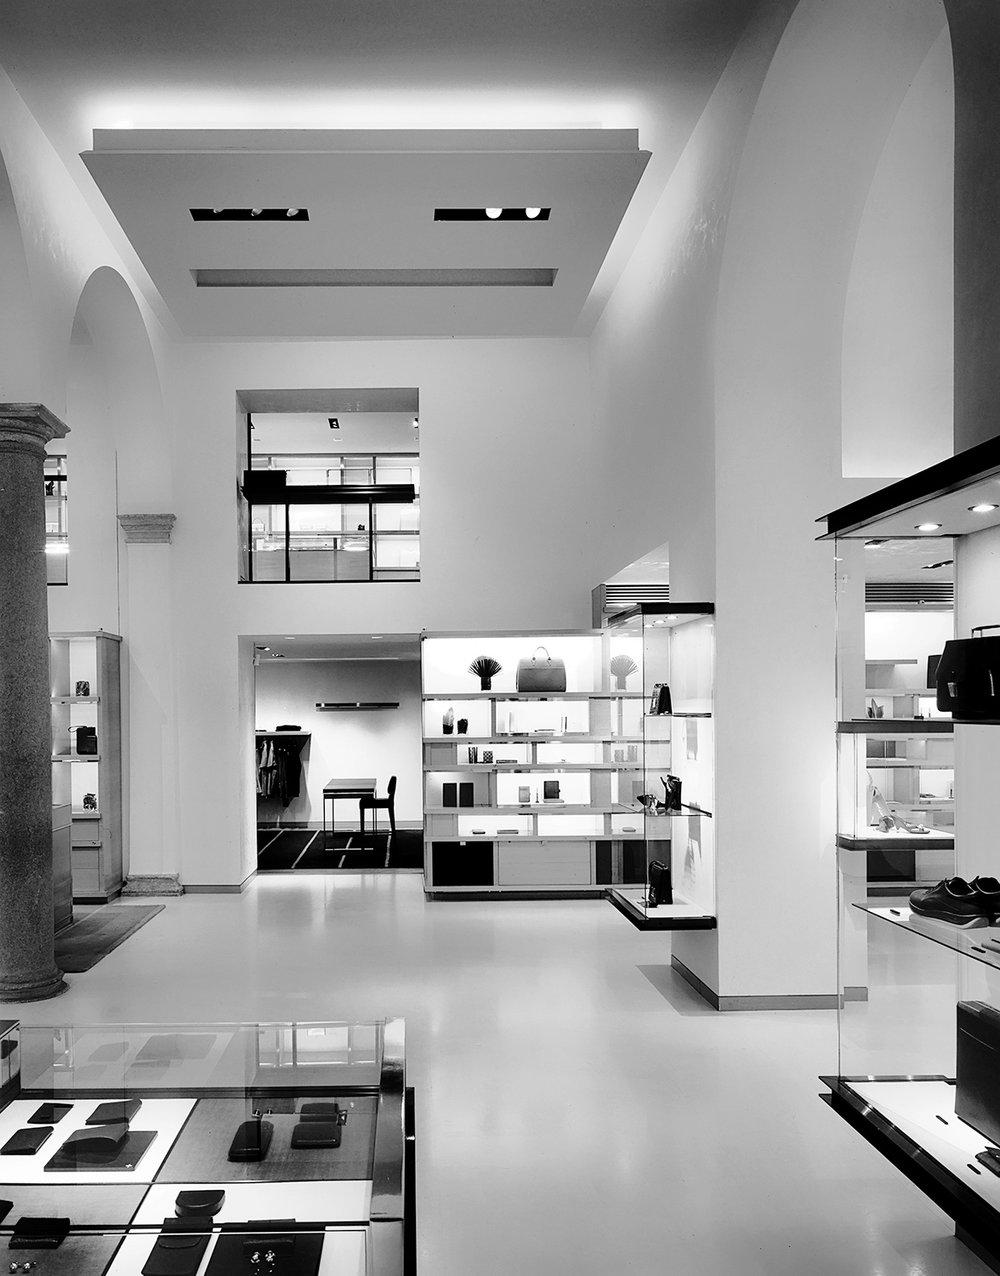 Louis Vuitton Via Montenapoleone  | Peter Marino | Milan